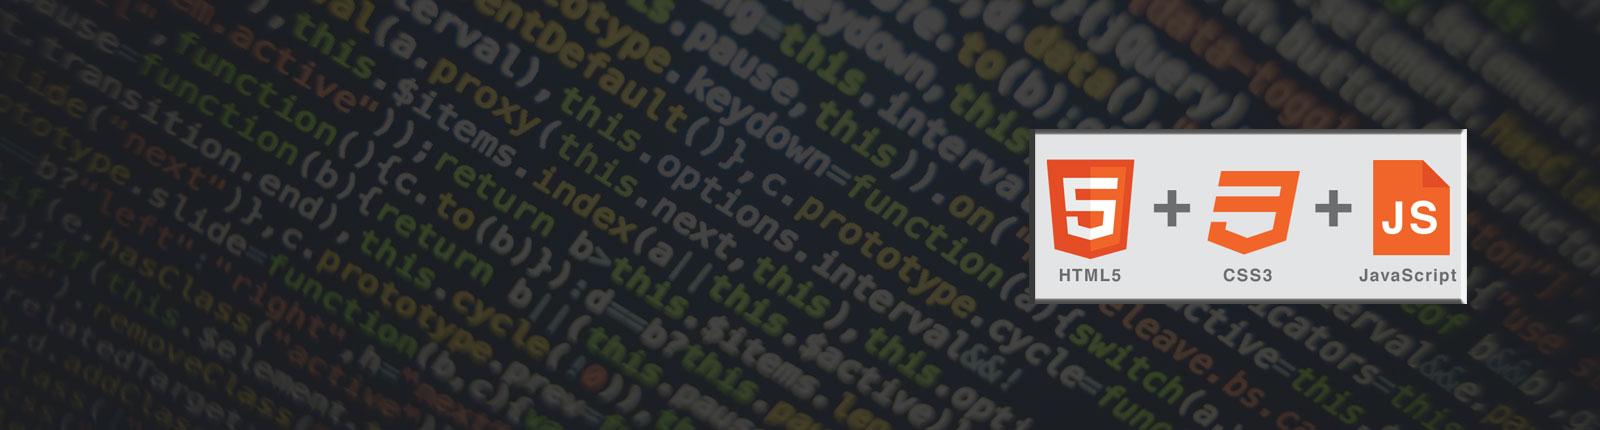 JavaScript Development Services | JavaScript Development Company